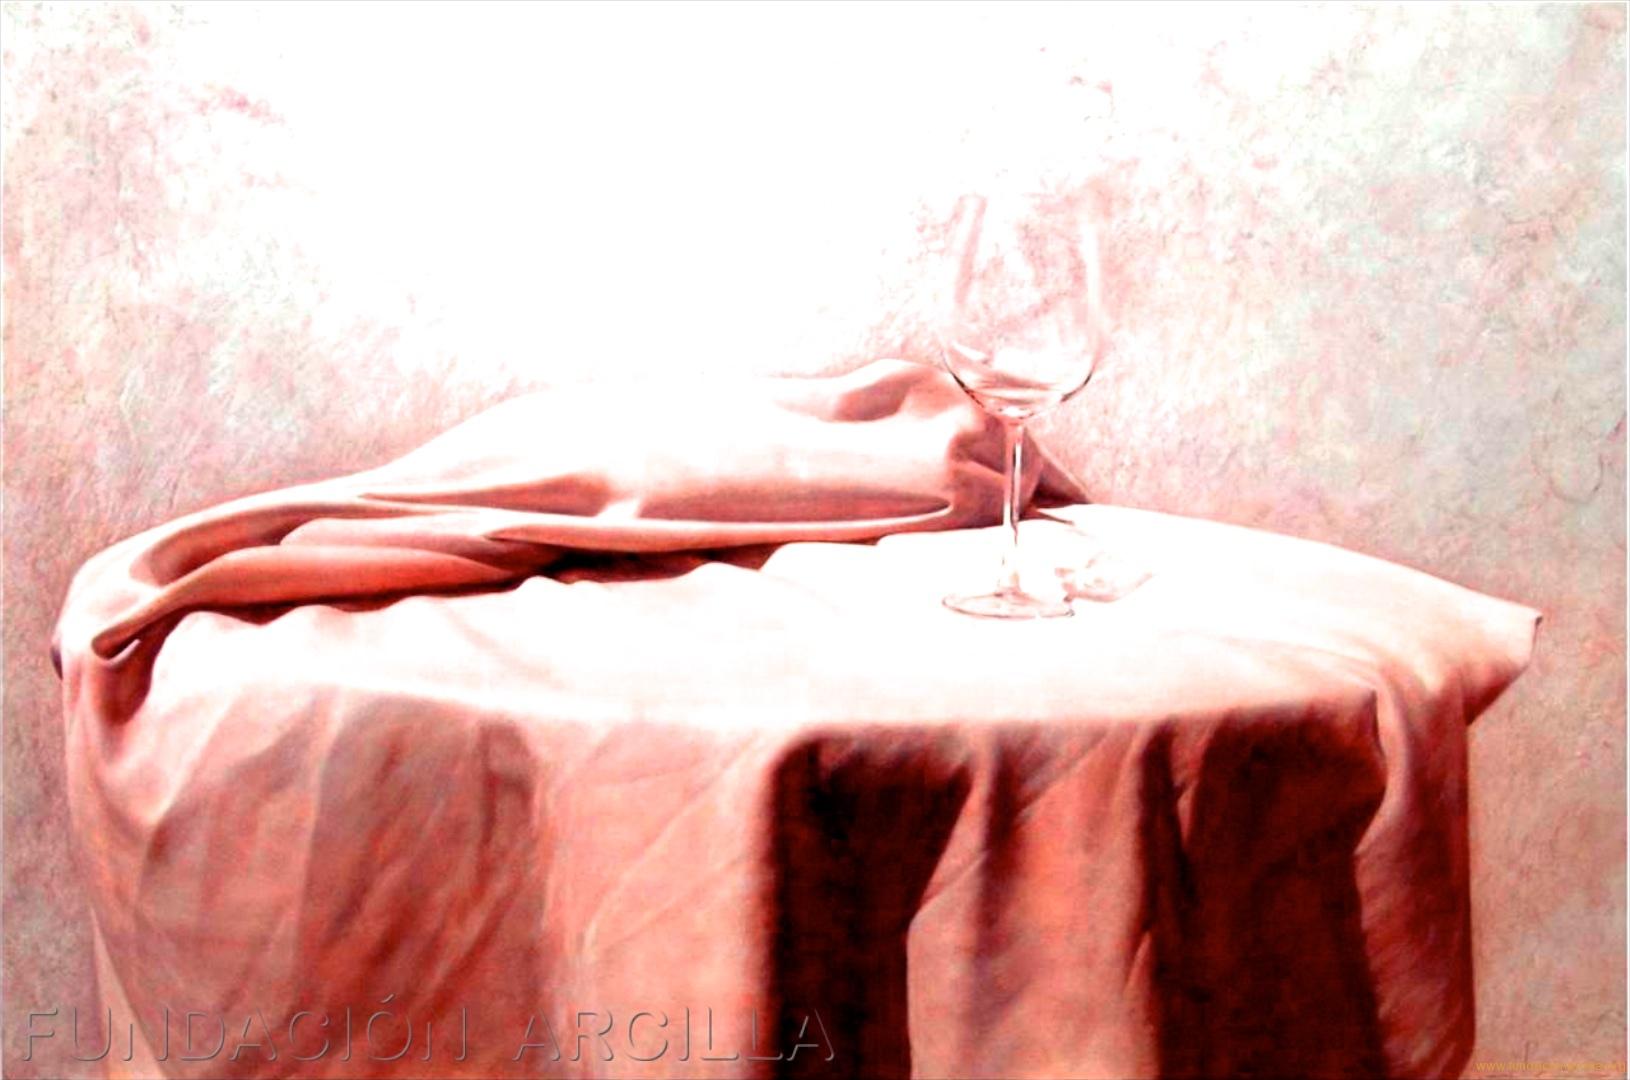 arcilla_pintura_bodegon (104)